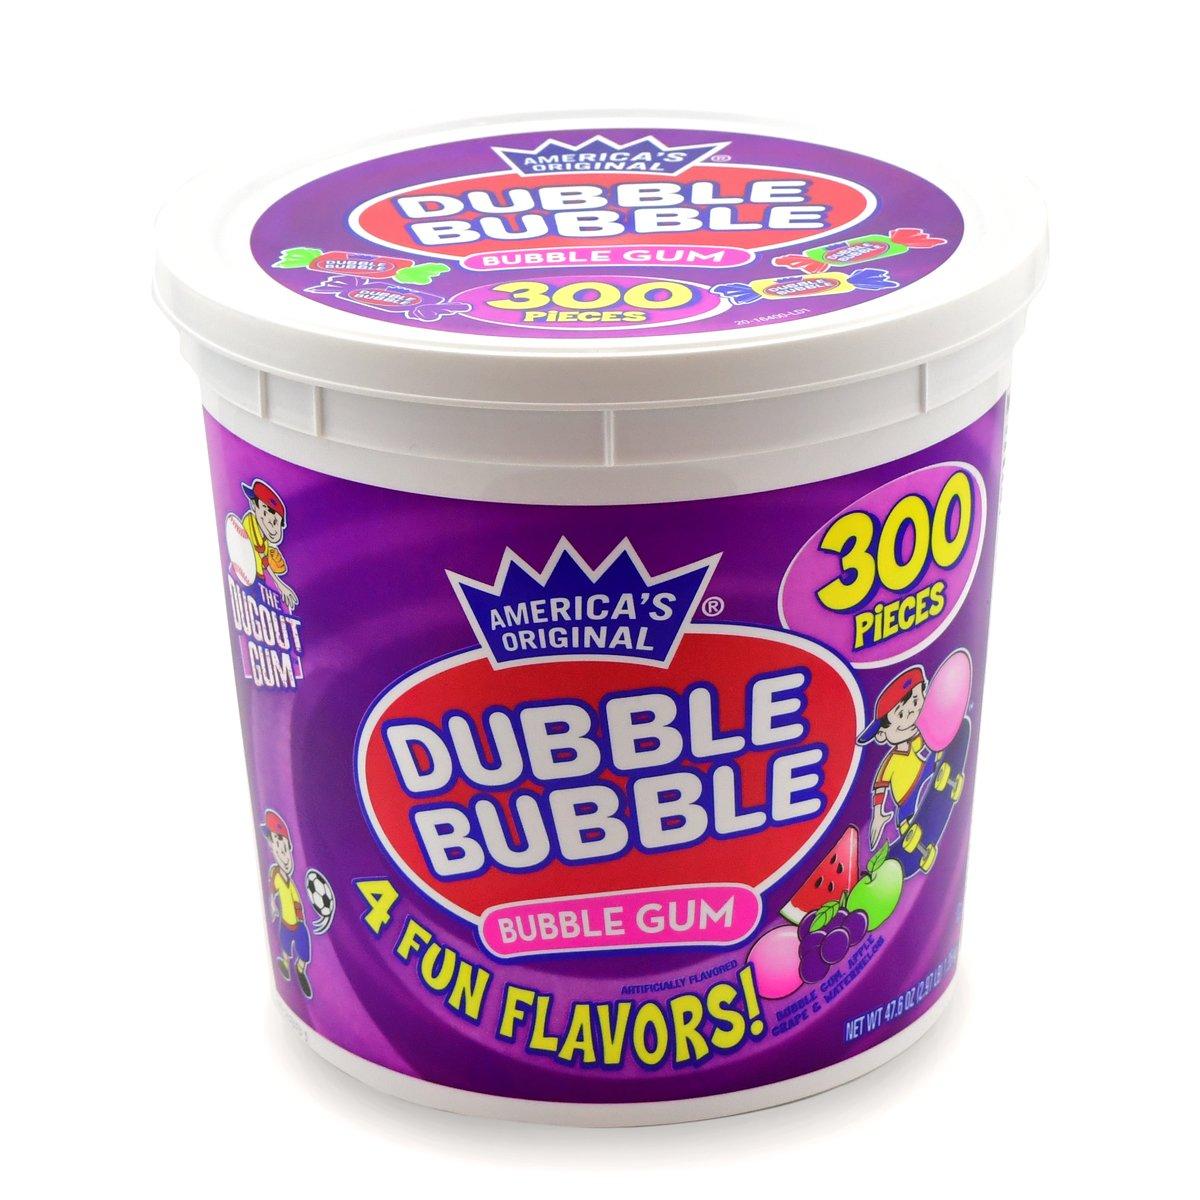 Dubble Bubble - Assorted Flavors, Reusable Tub (300 Count) Peanut Free,  Gluten Free